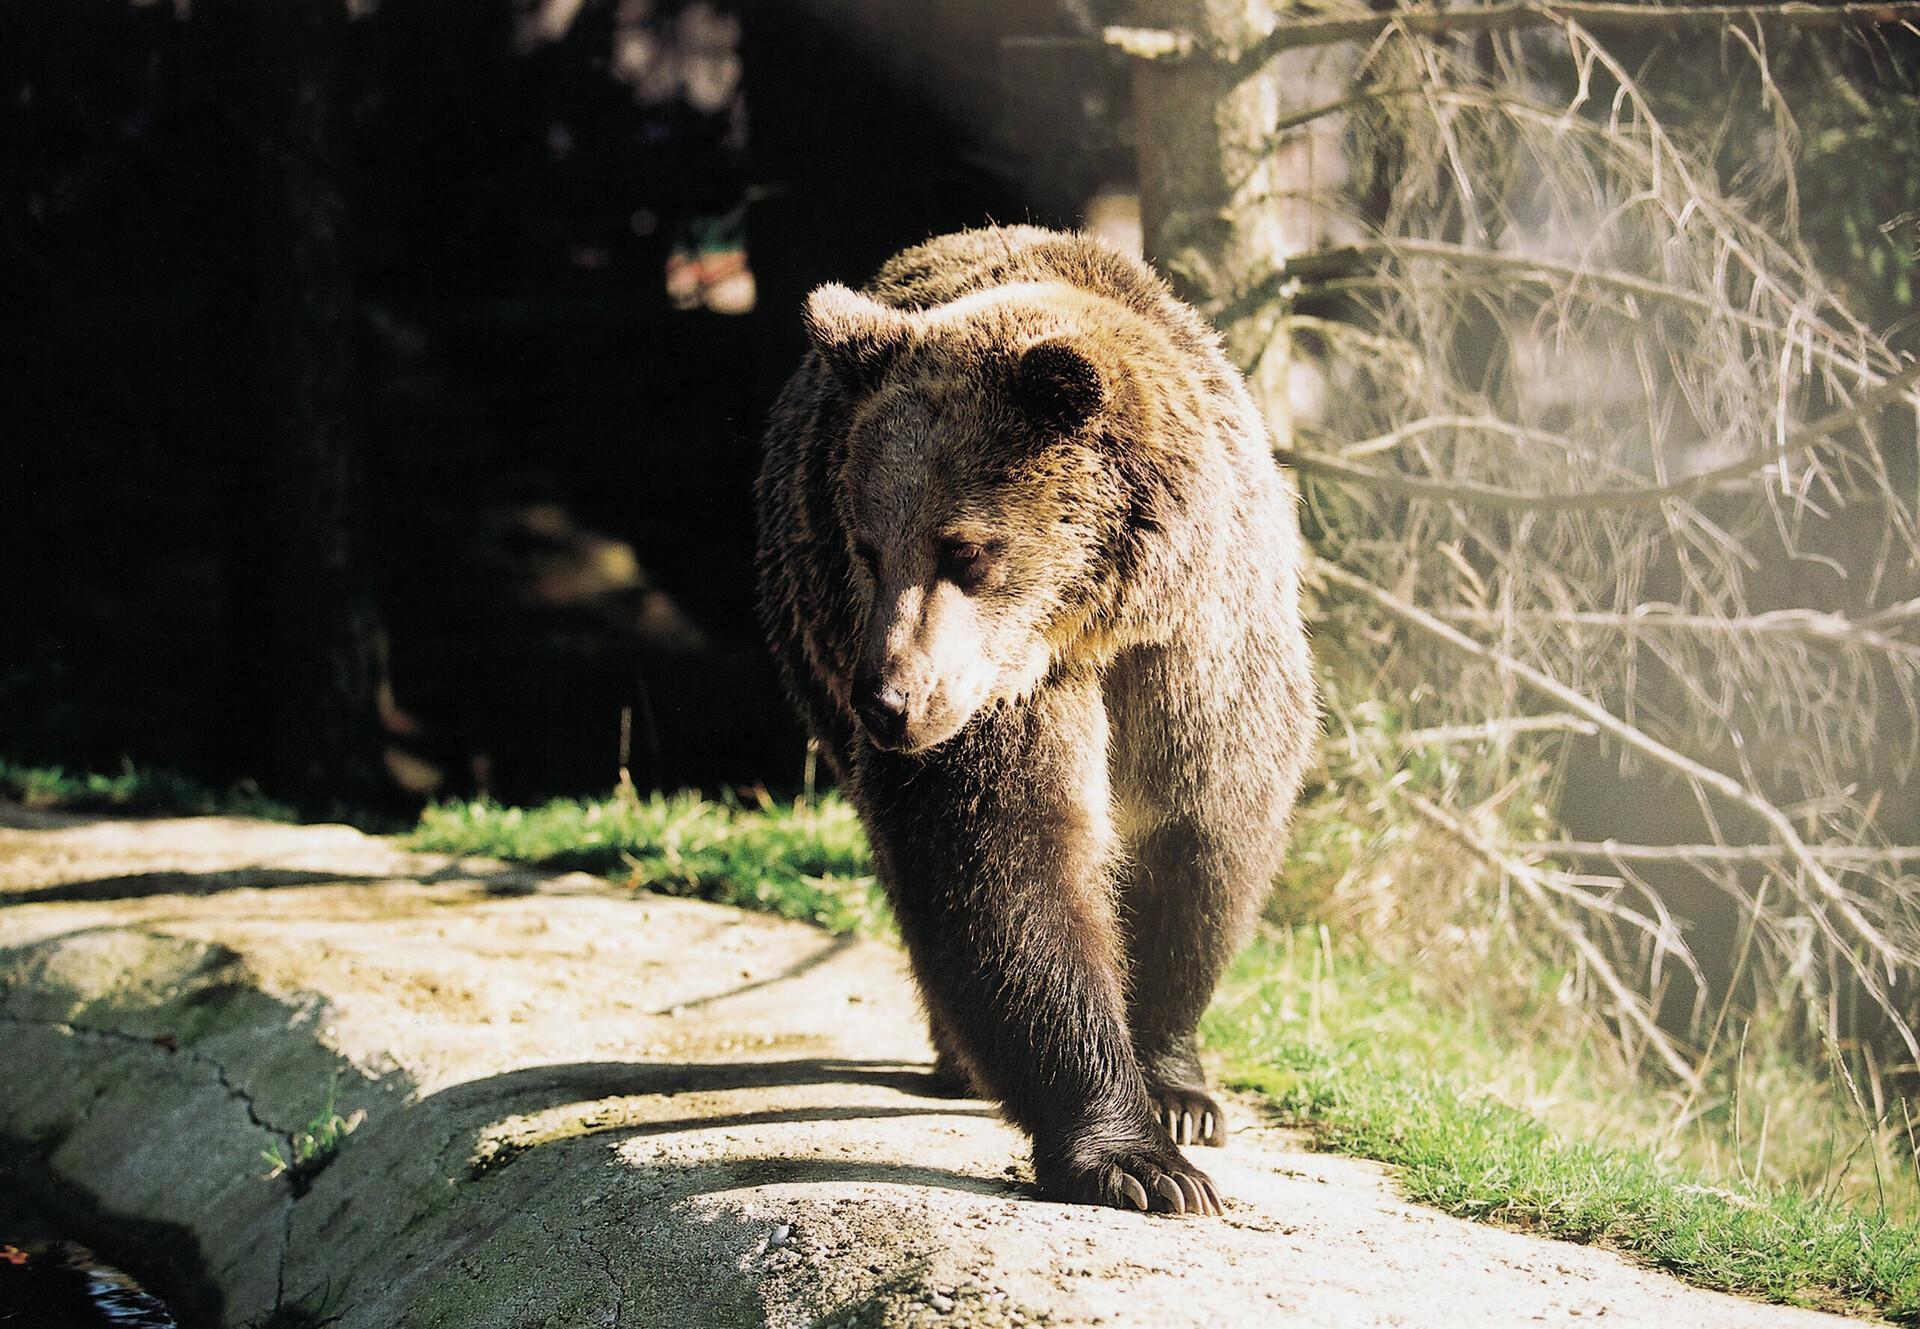 Bear Brumca in BEAR SANCTUARY Arbesbach